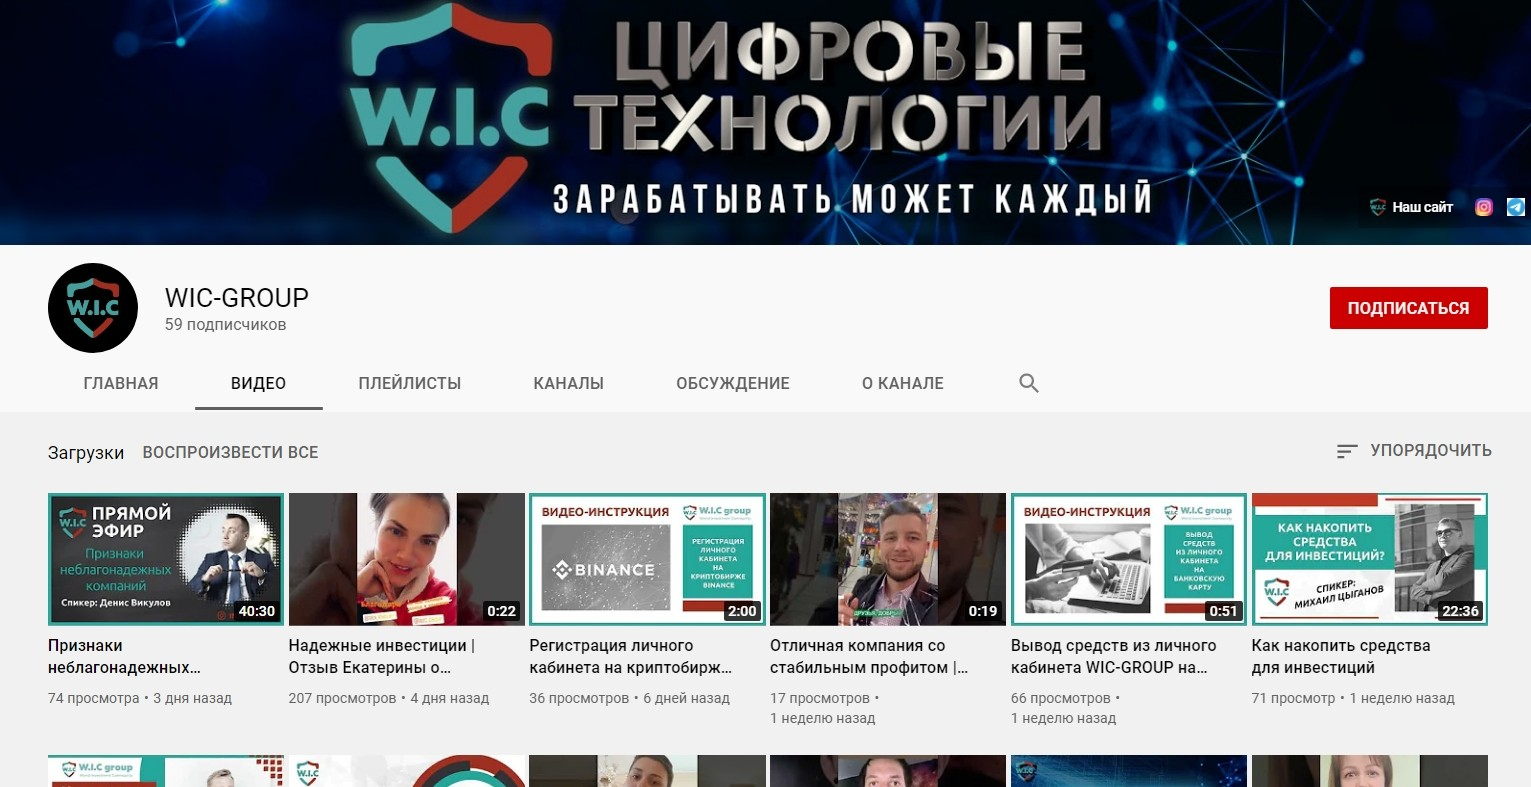 Ютуб канал WIC-group